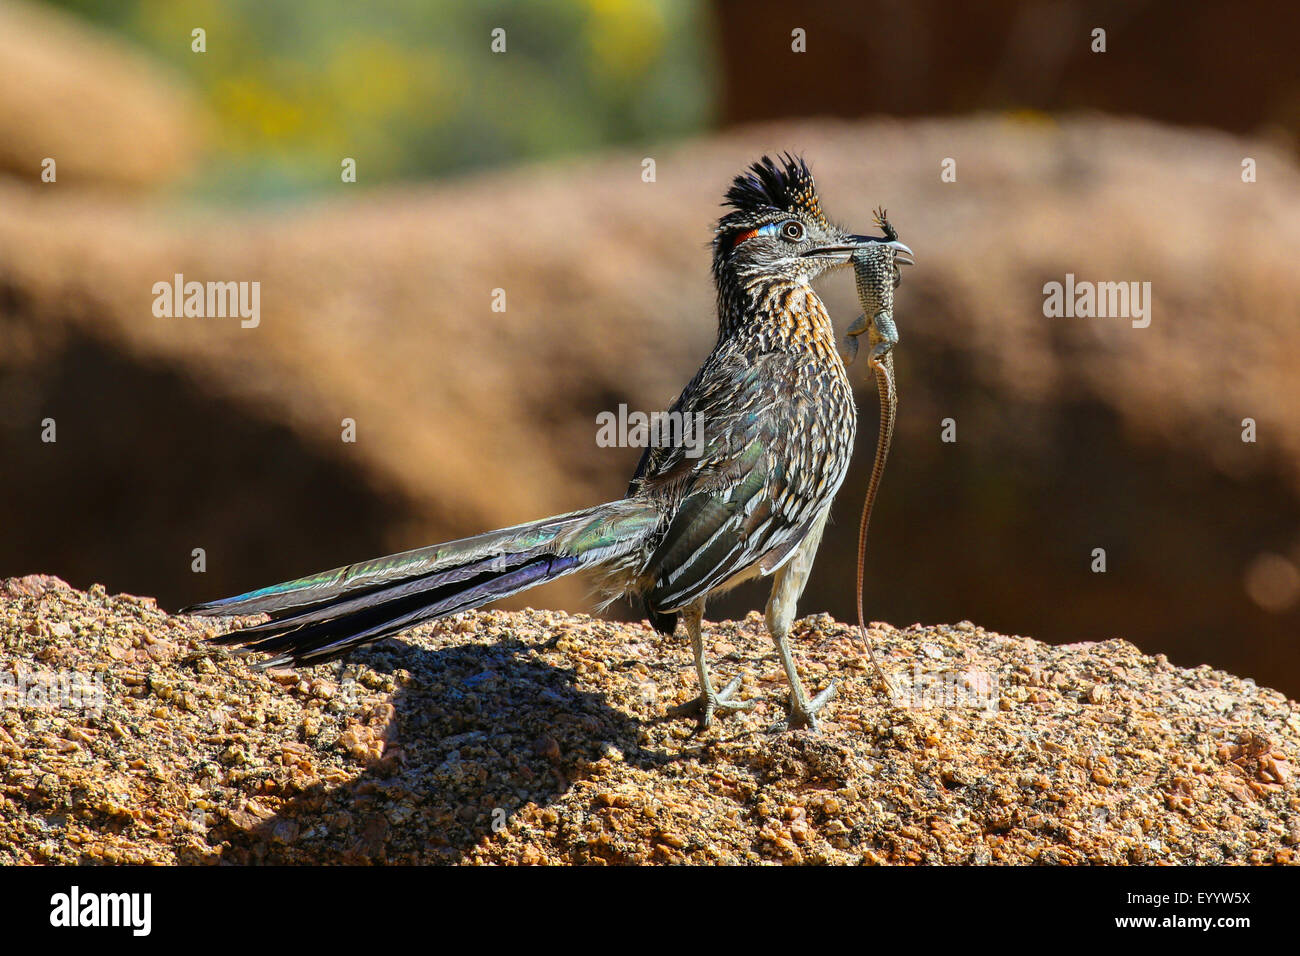 Lesser road-runner (Geococcyx velox), with caught lizzard in its bill, USA, Arizona, Pinnacle Peak - Stock Image